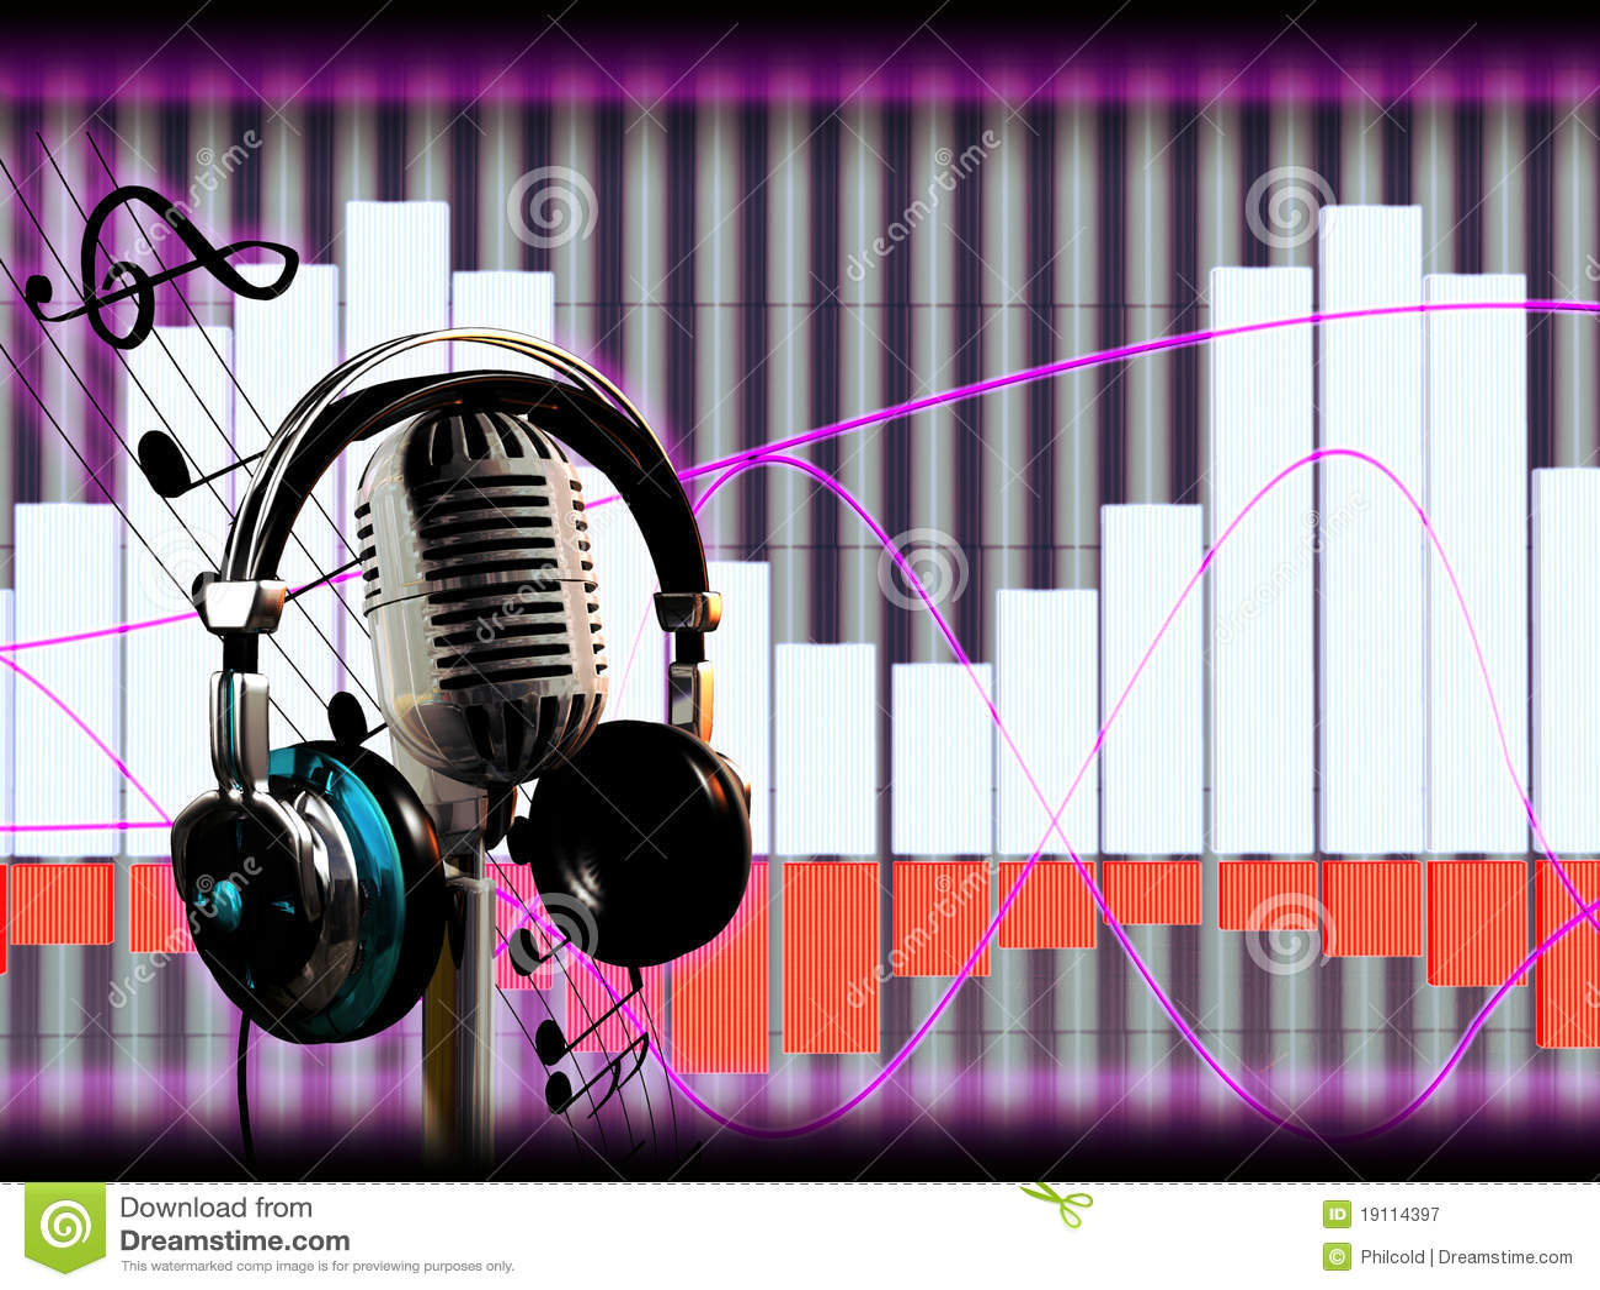 Headphones Music Microphones 4500x4100 Wallpaper: Microphone And Headphones Stock Illustration. Image Of